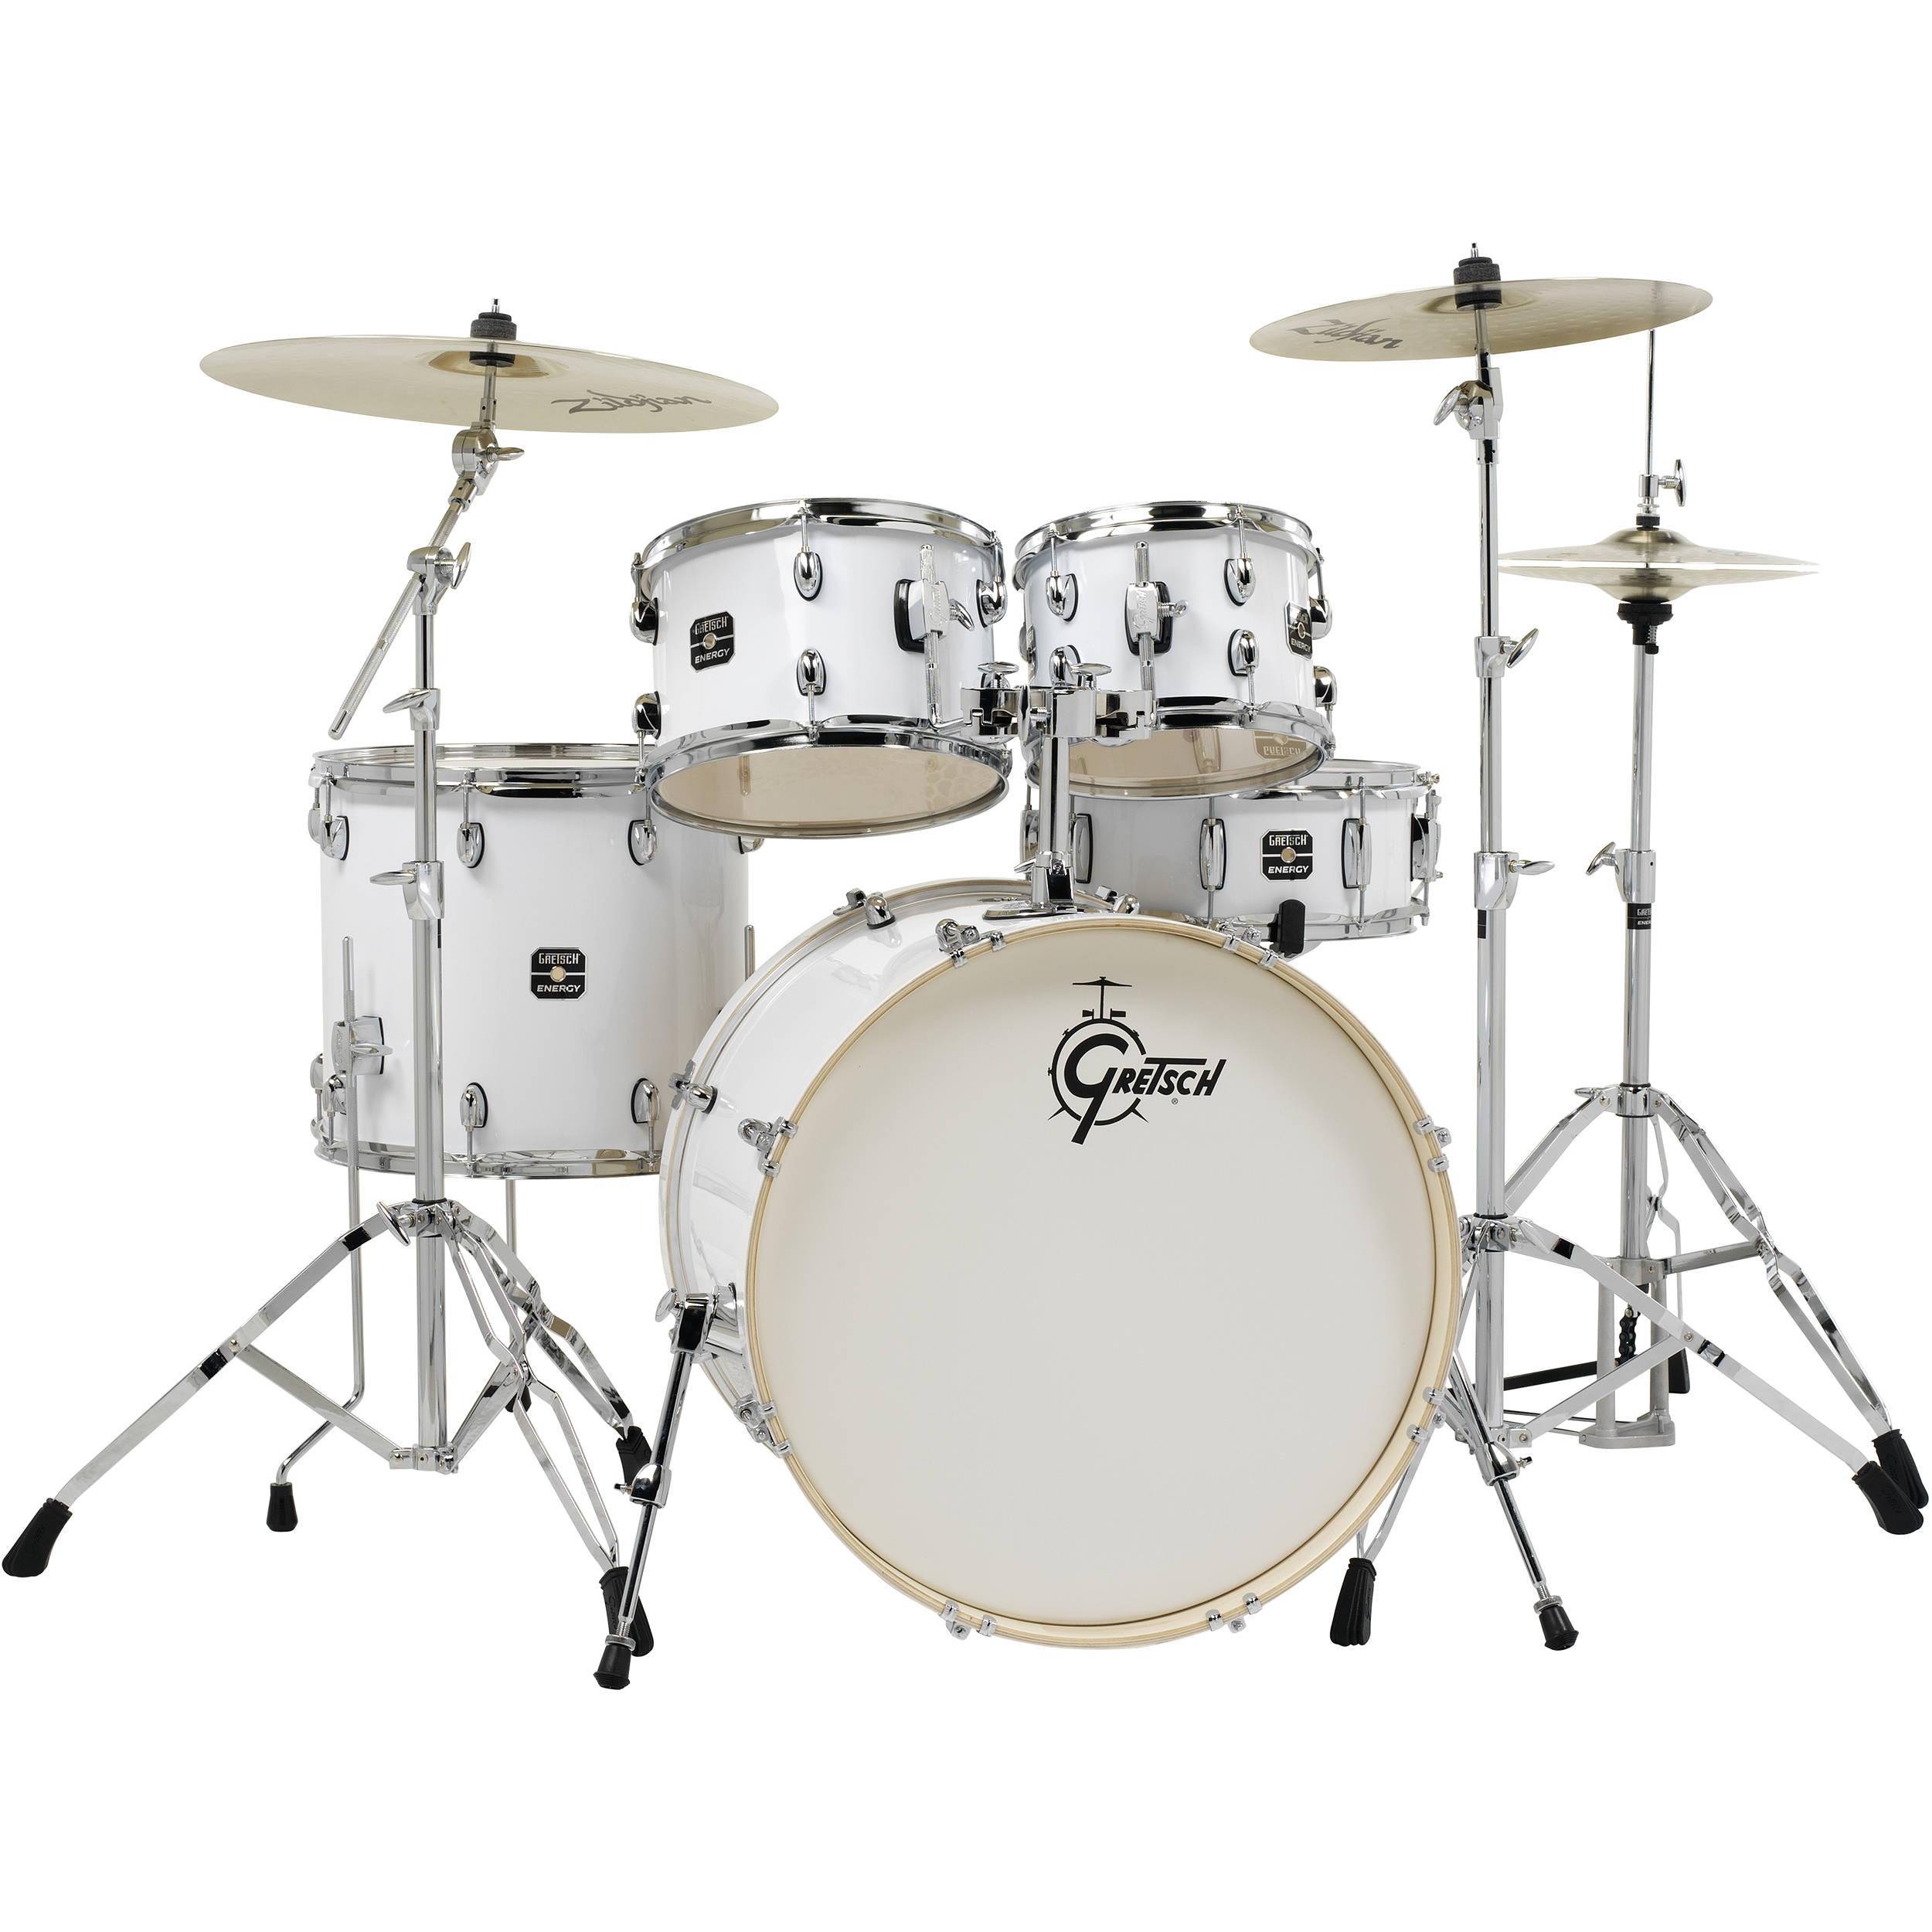 gretsch drums energy series 5 piece drum set ge4e825zw b h photo. Black Bedroom Furniture Sets. Home Design Ideas